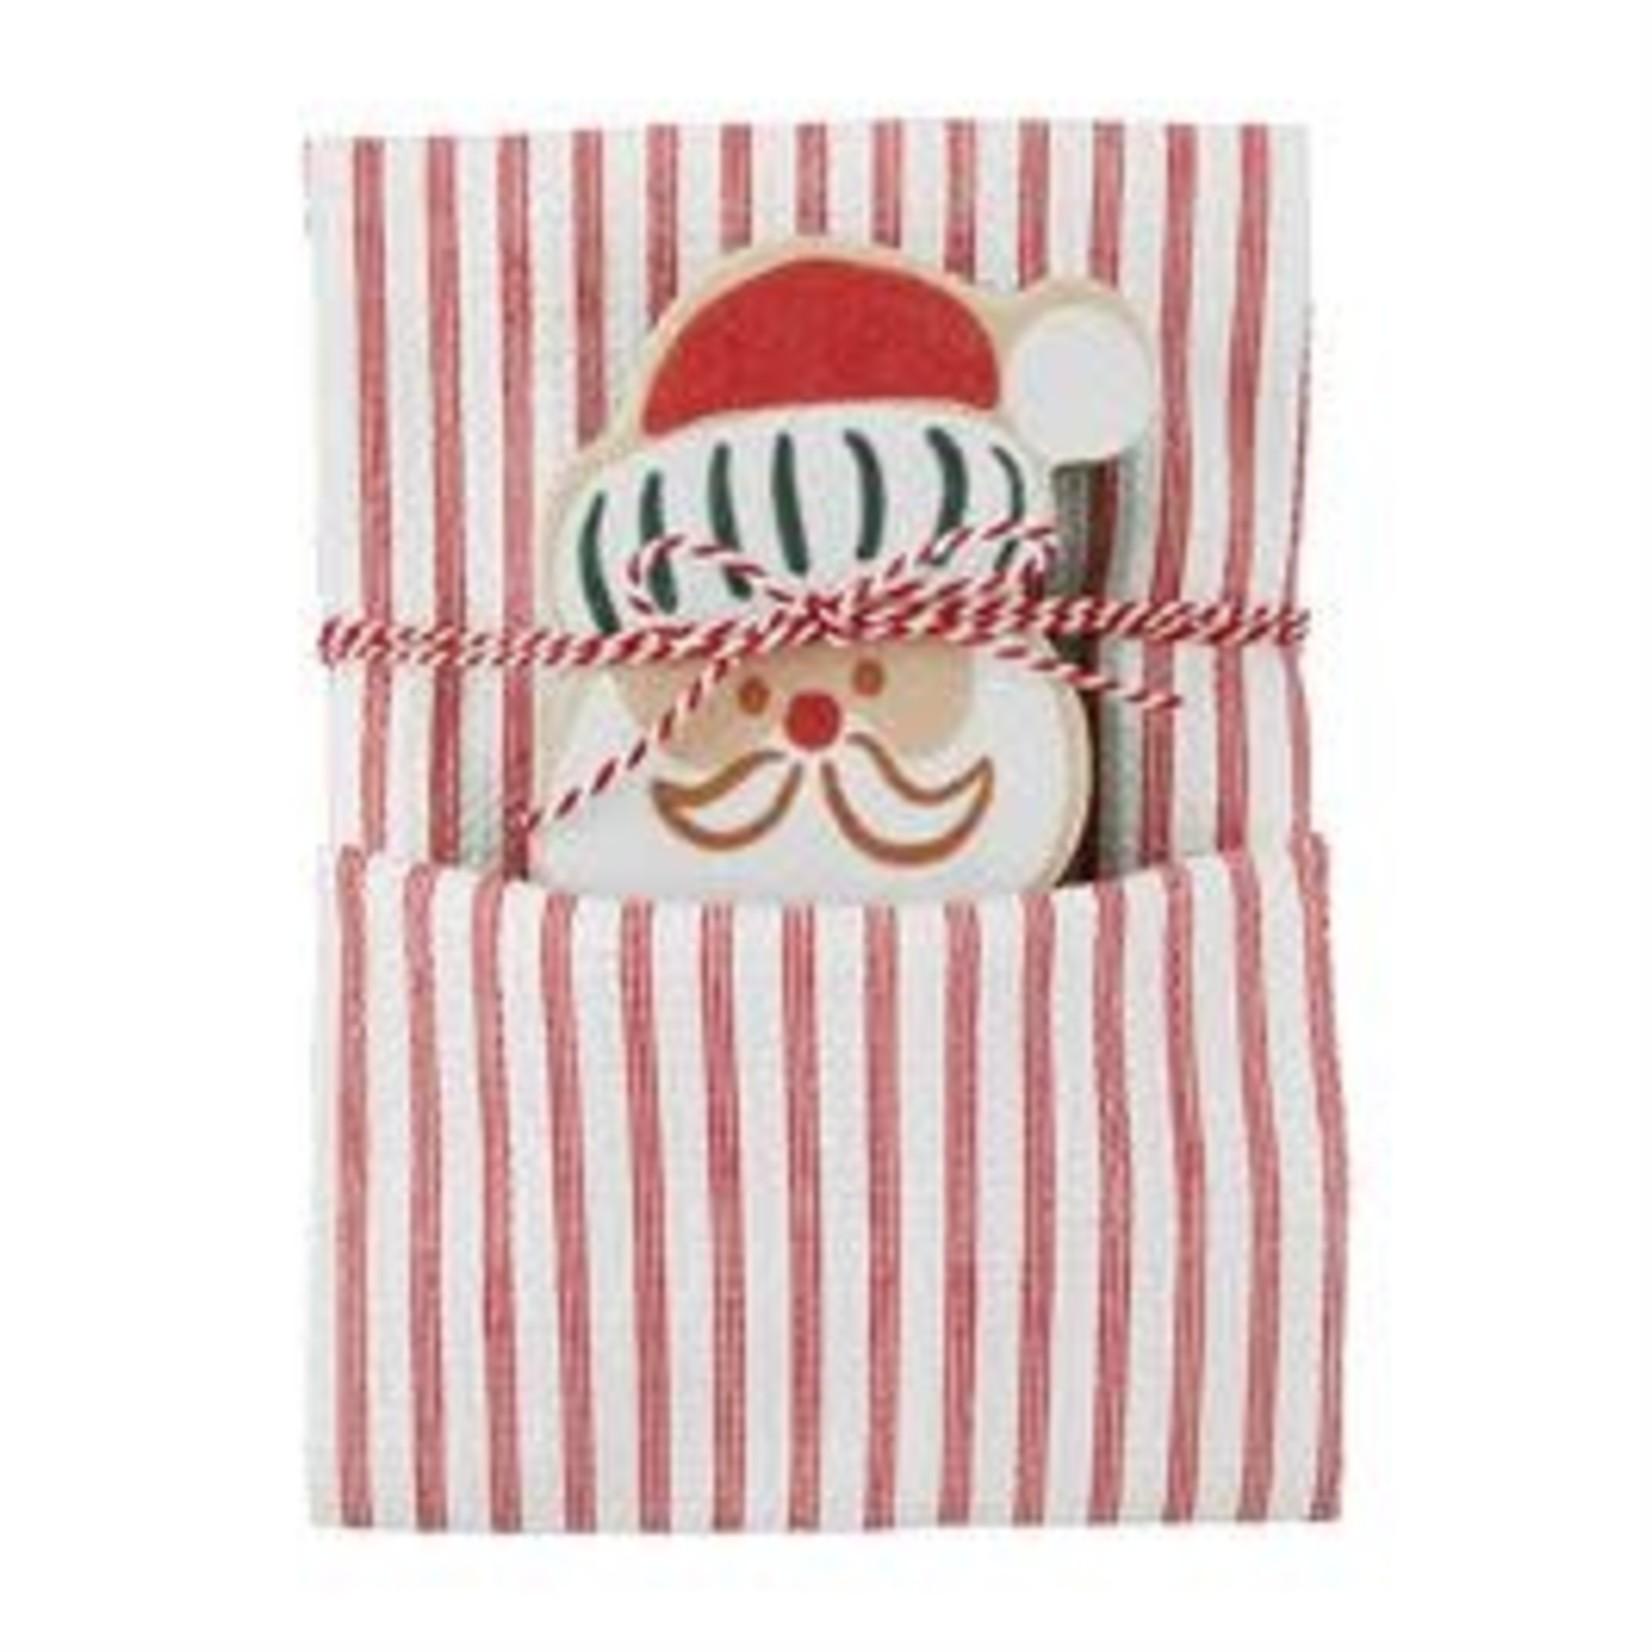 Mudpie CHRISTMAS TOWEL AND SPONGE SET